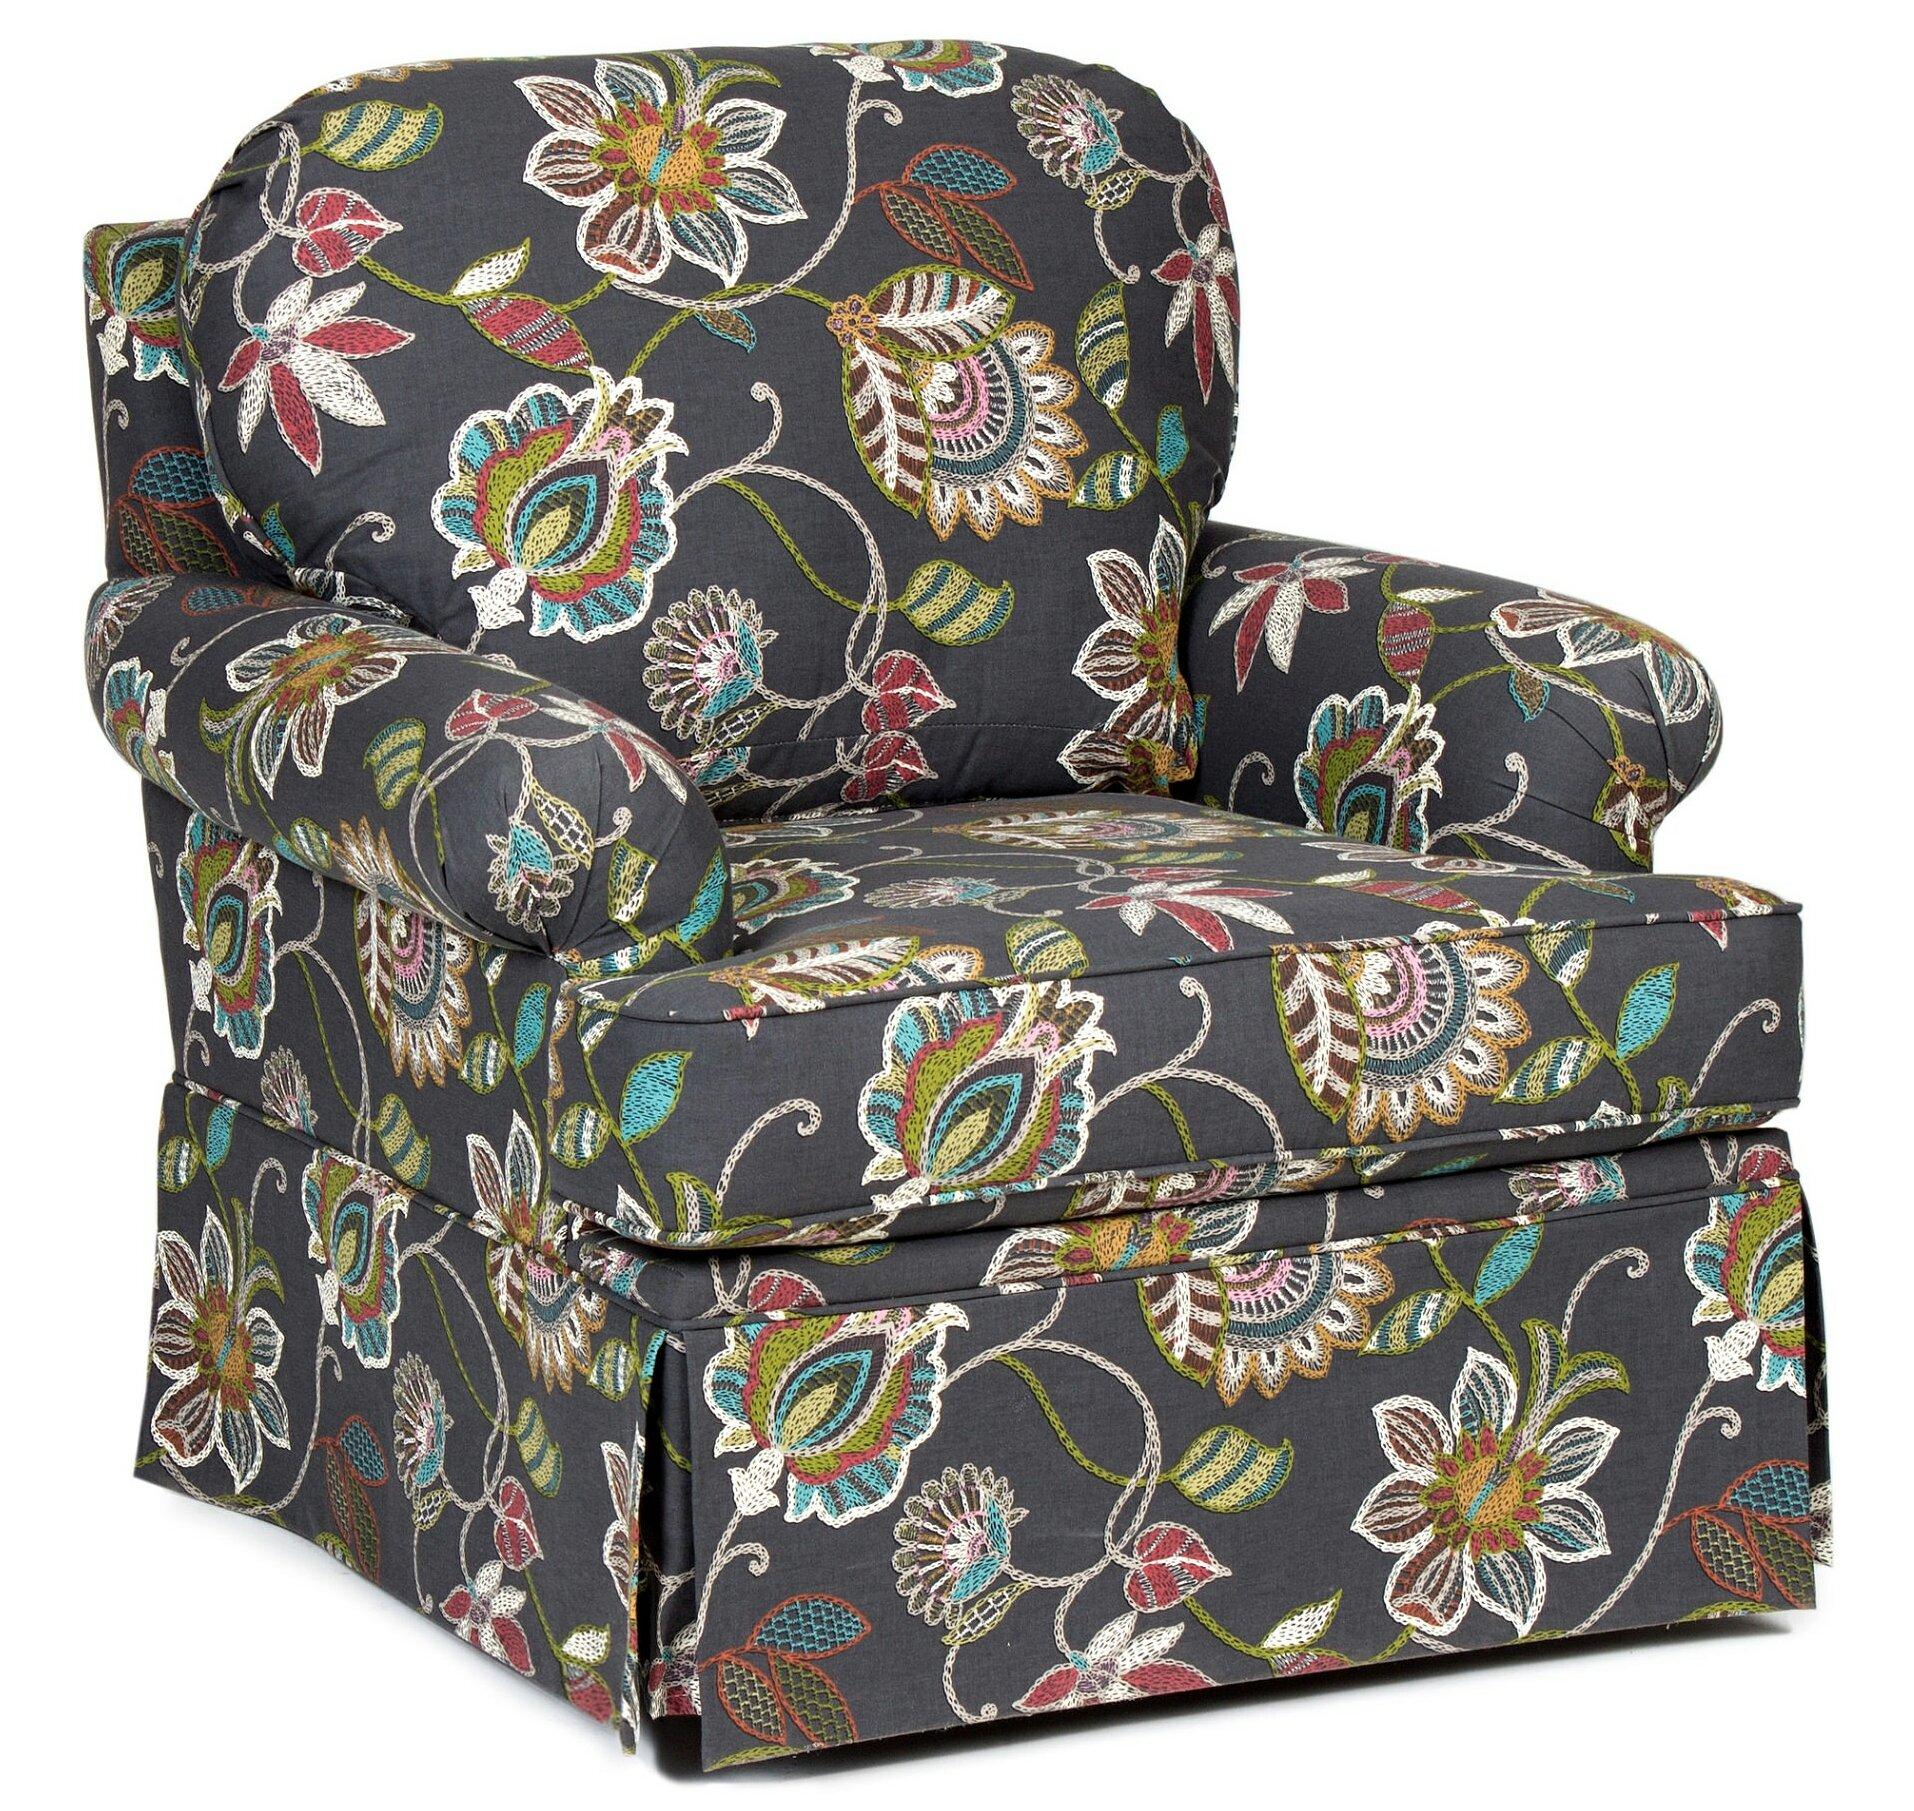 Red Barrel Studio Harlen Upholstered Swivel Rocker Armchair | Wayfair